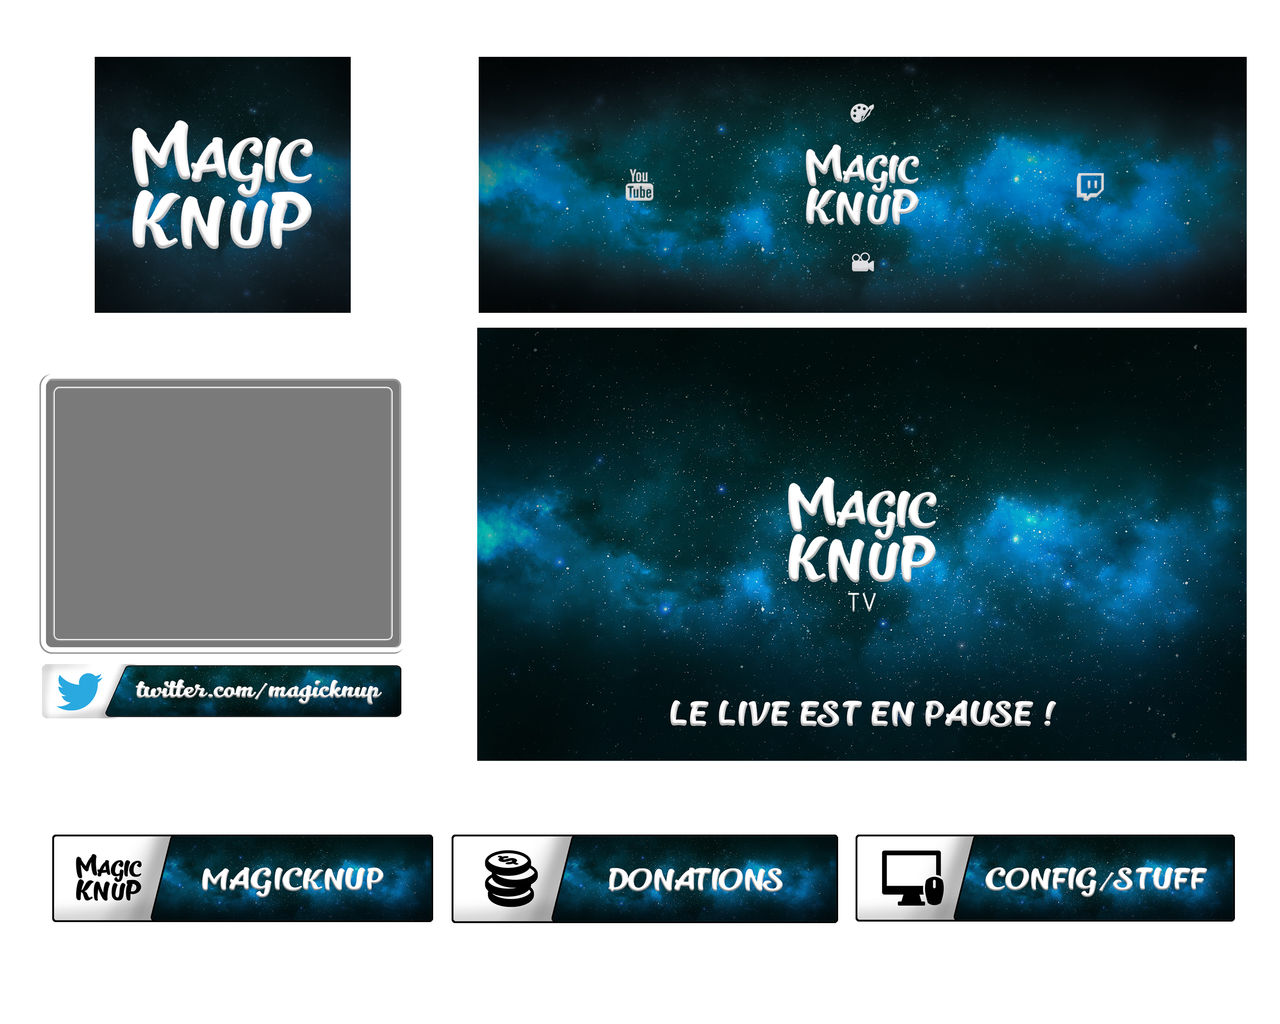 Magicknup TV